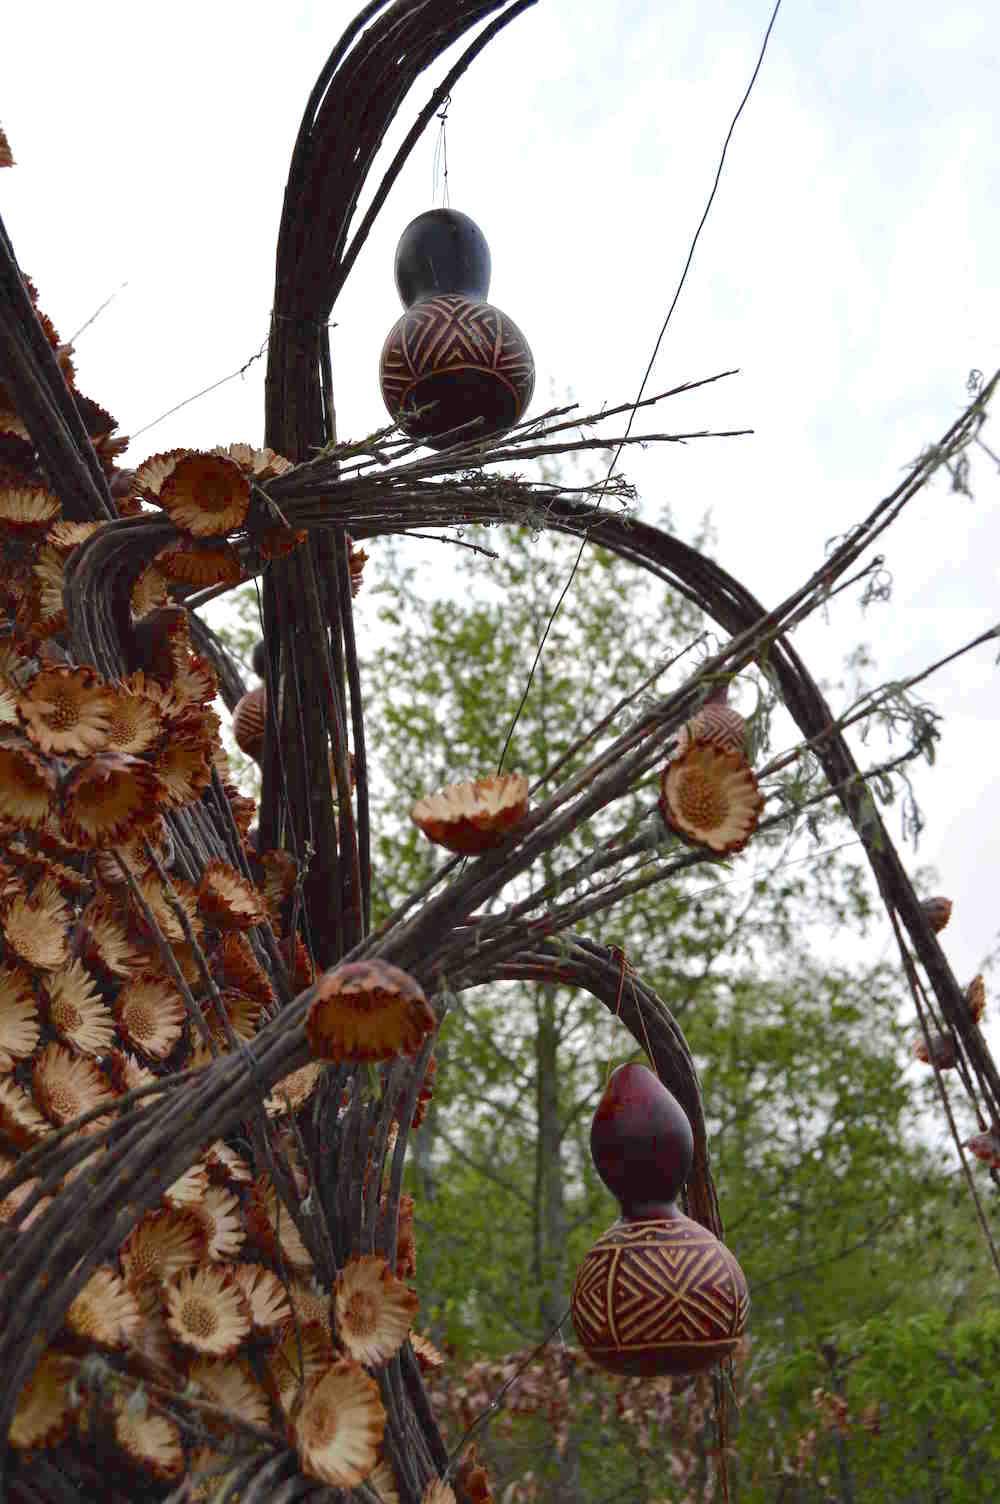 Protea seedheads and gourds in 'African Kitchen' garden, design Leon Kluge